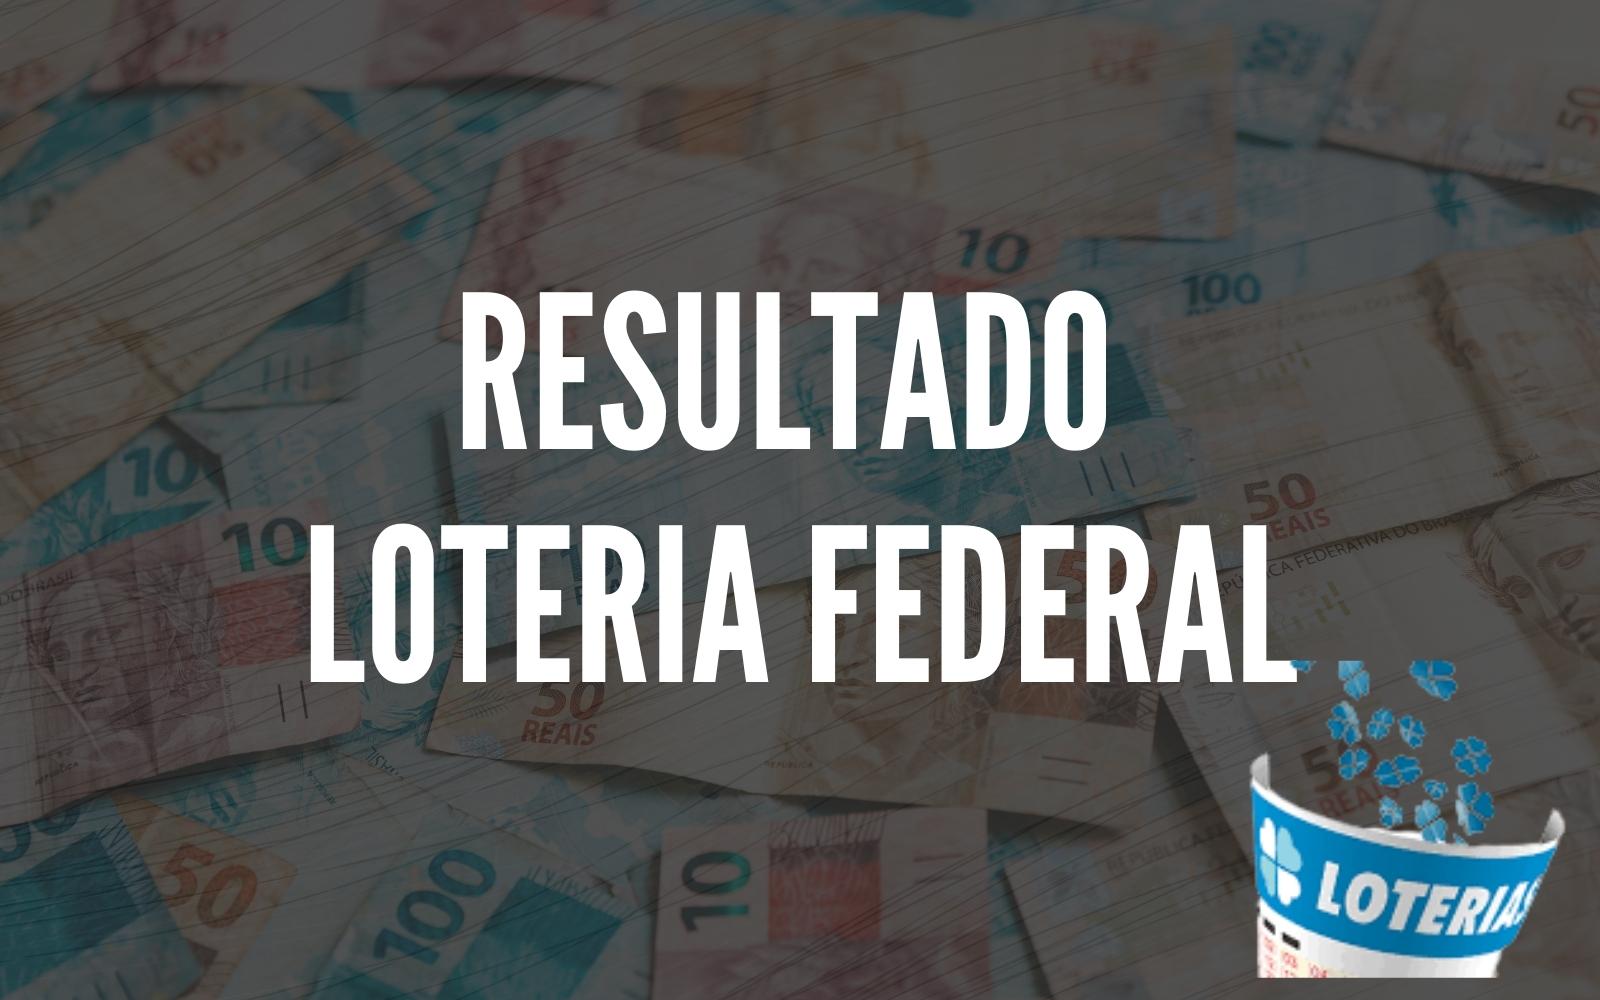 Resultado Loteria Federal 5606 de hoje (16/10)